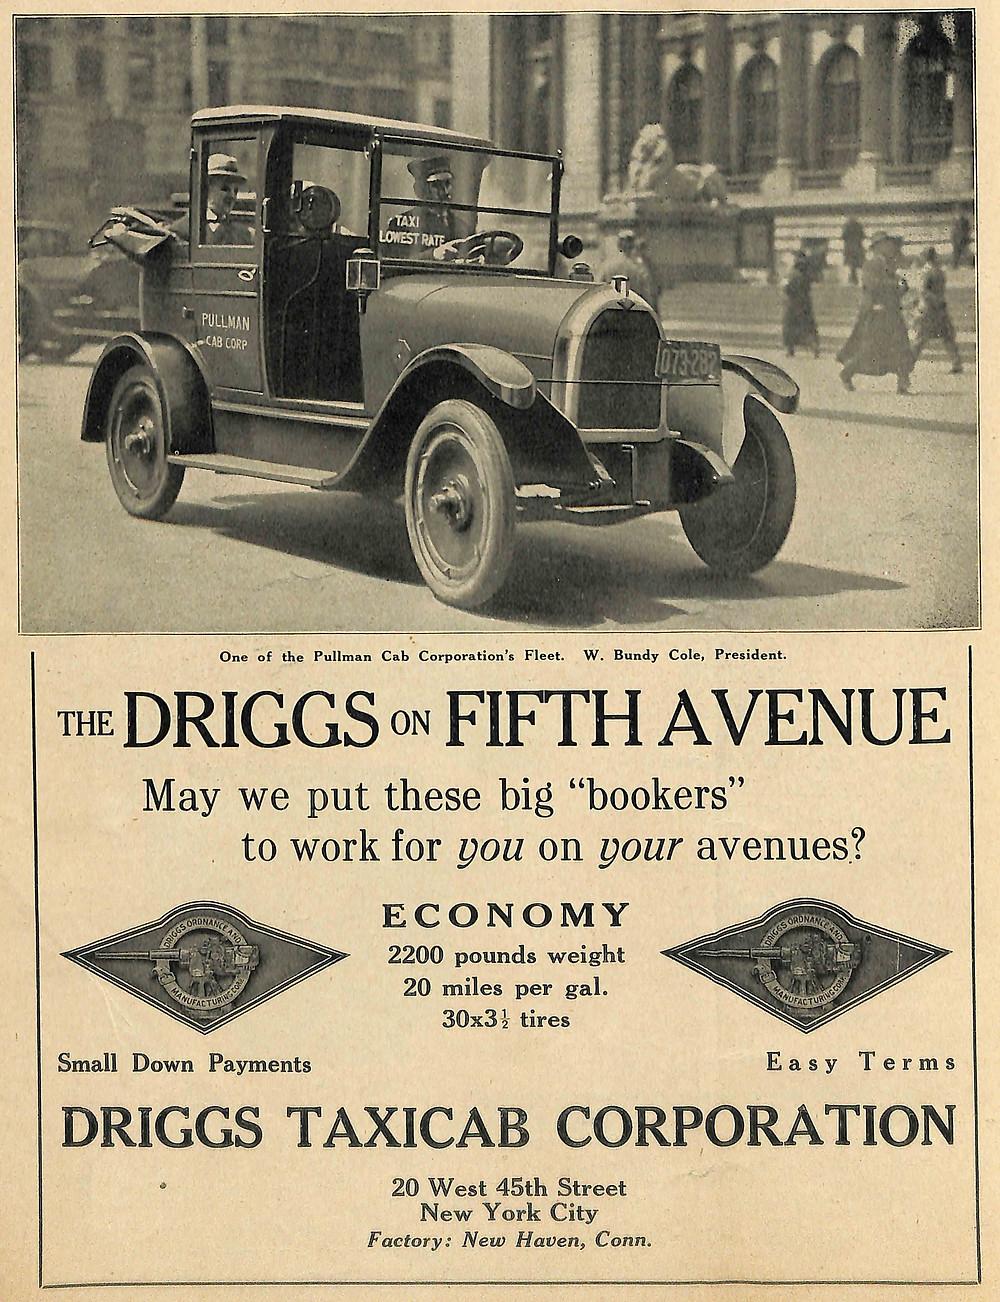 Driggs Taxi, Driggs Cab